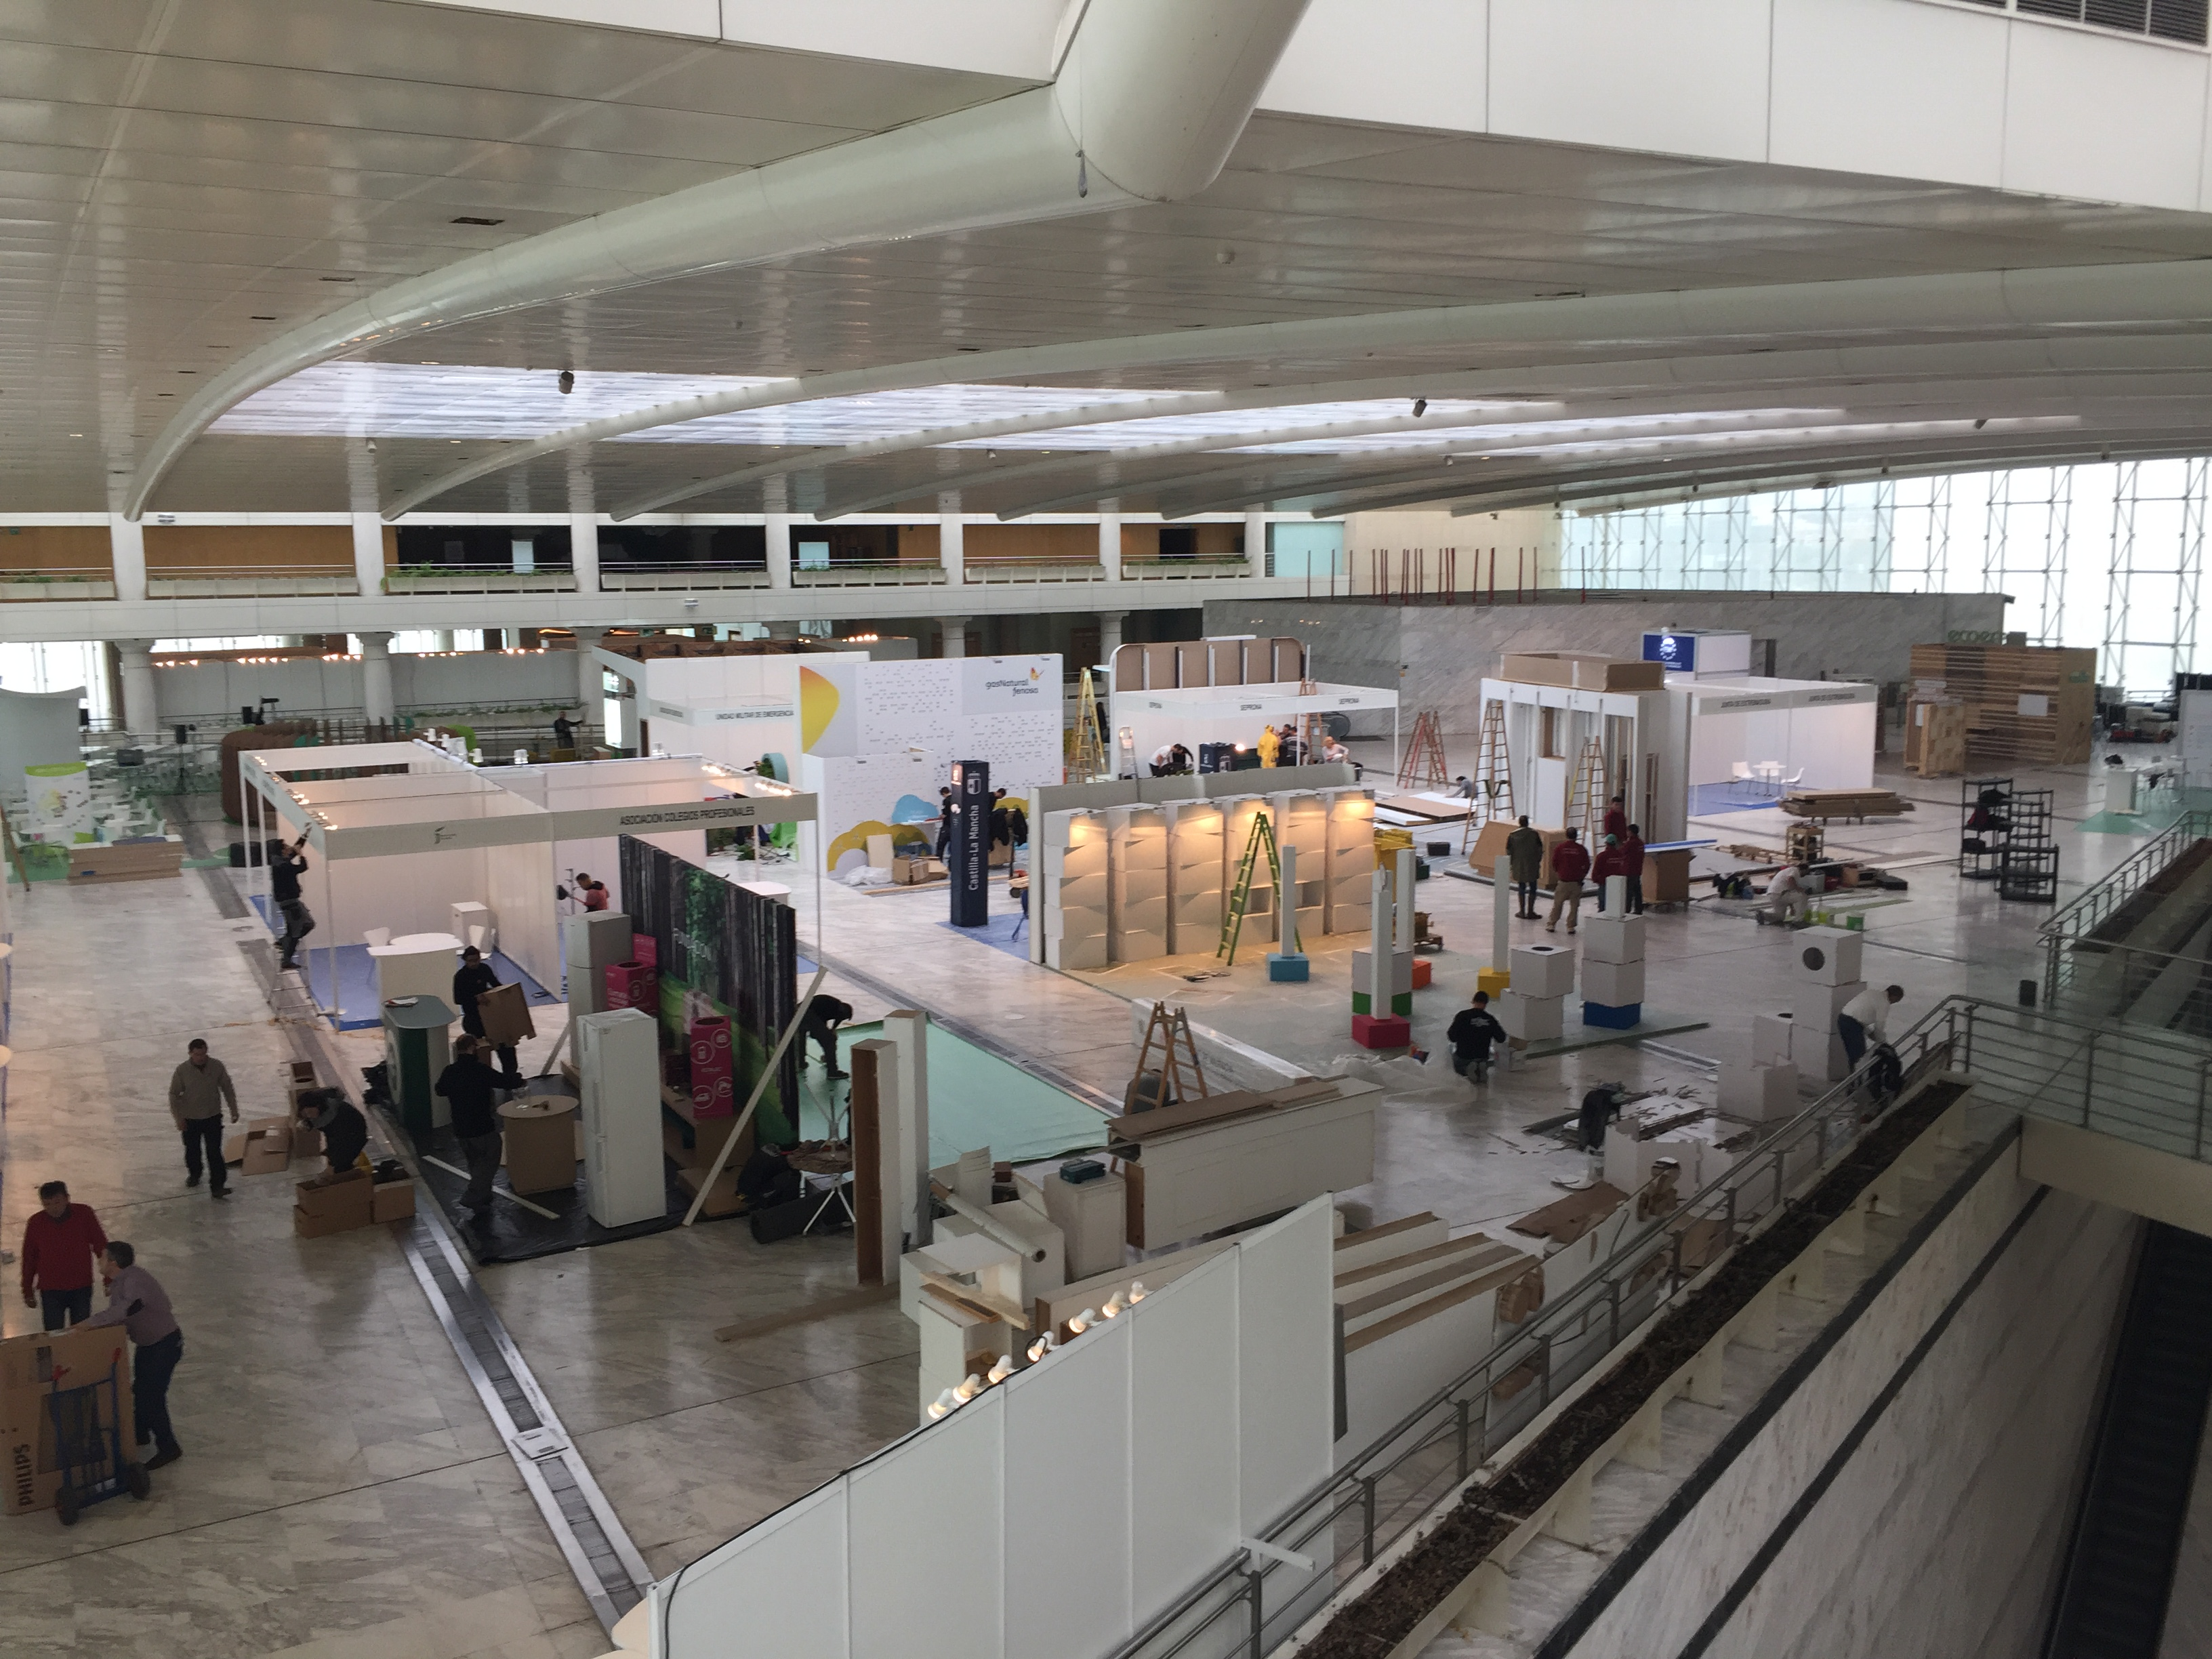 Coordinación-Exposición-CONAMA-Di&P